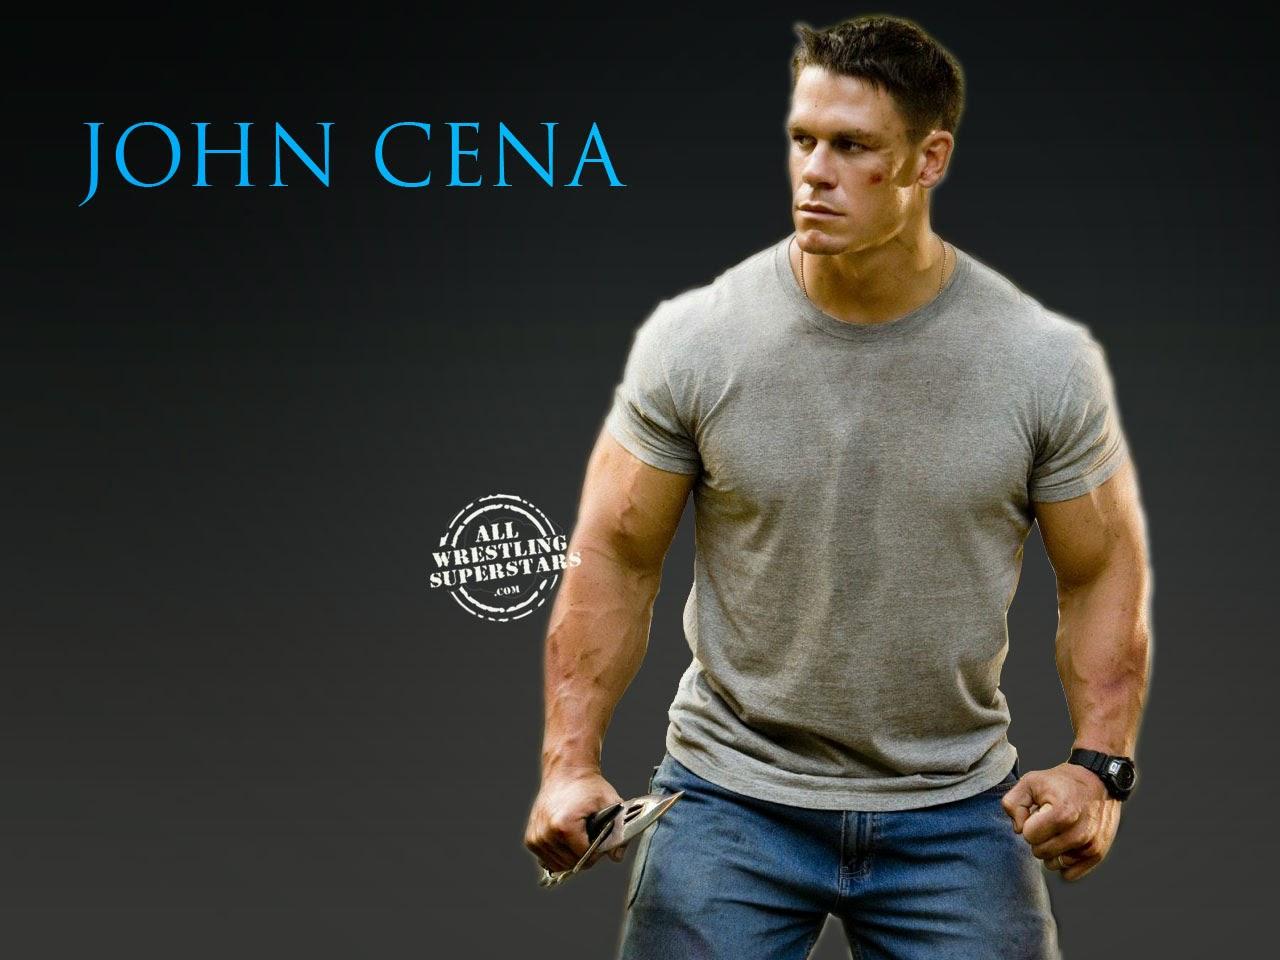 John Cena Desktop Wallpapers John Cena HD Wallpaper Download 1280x960